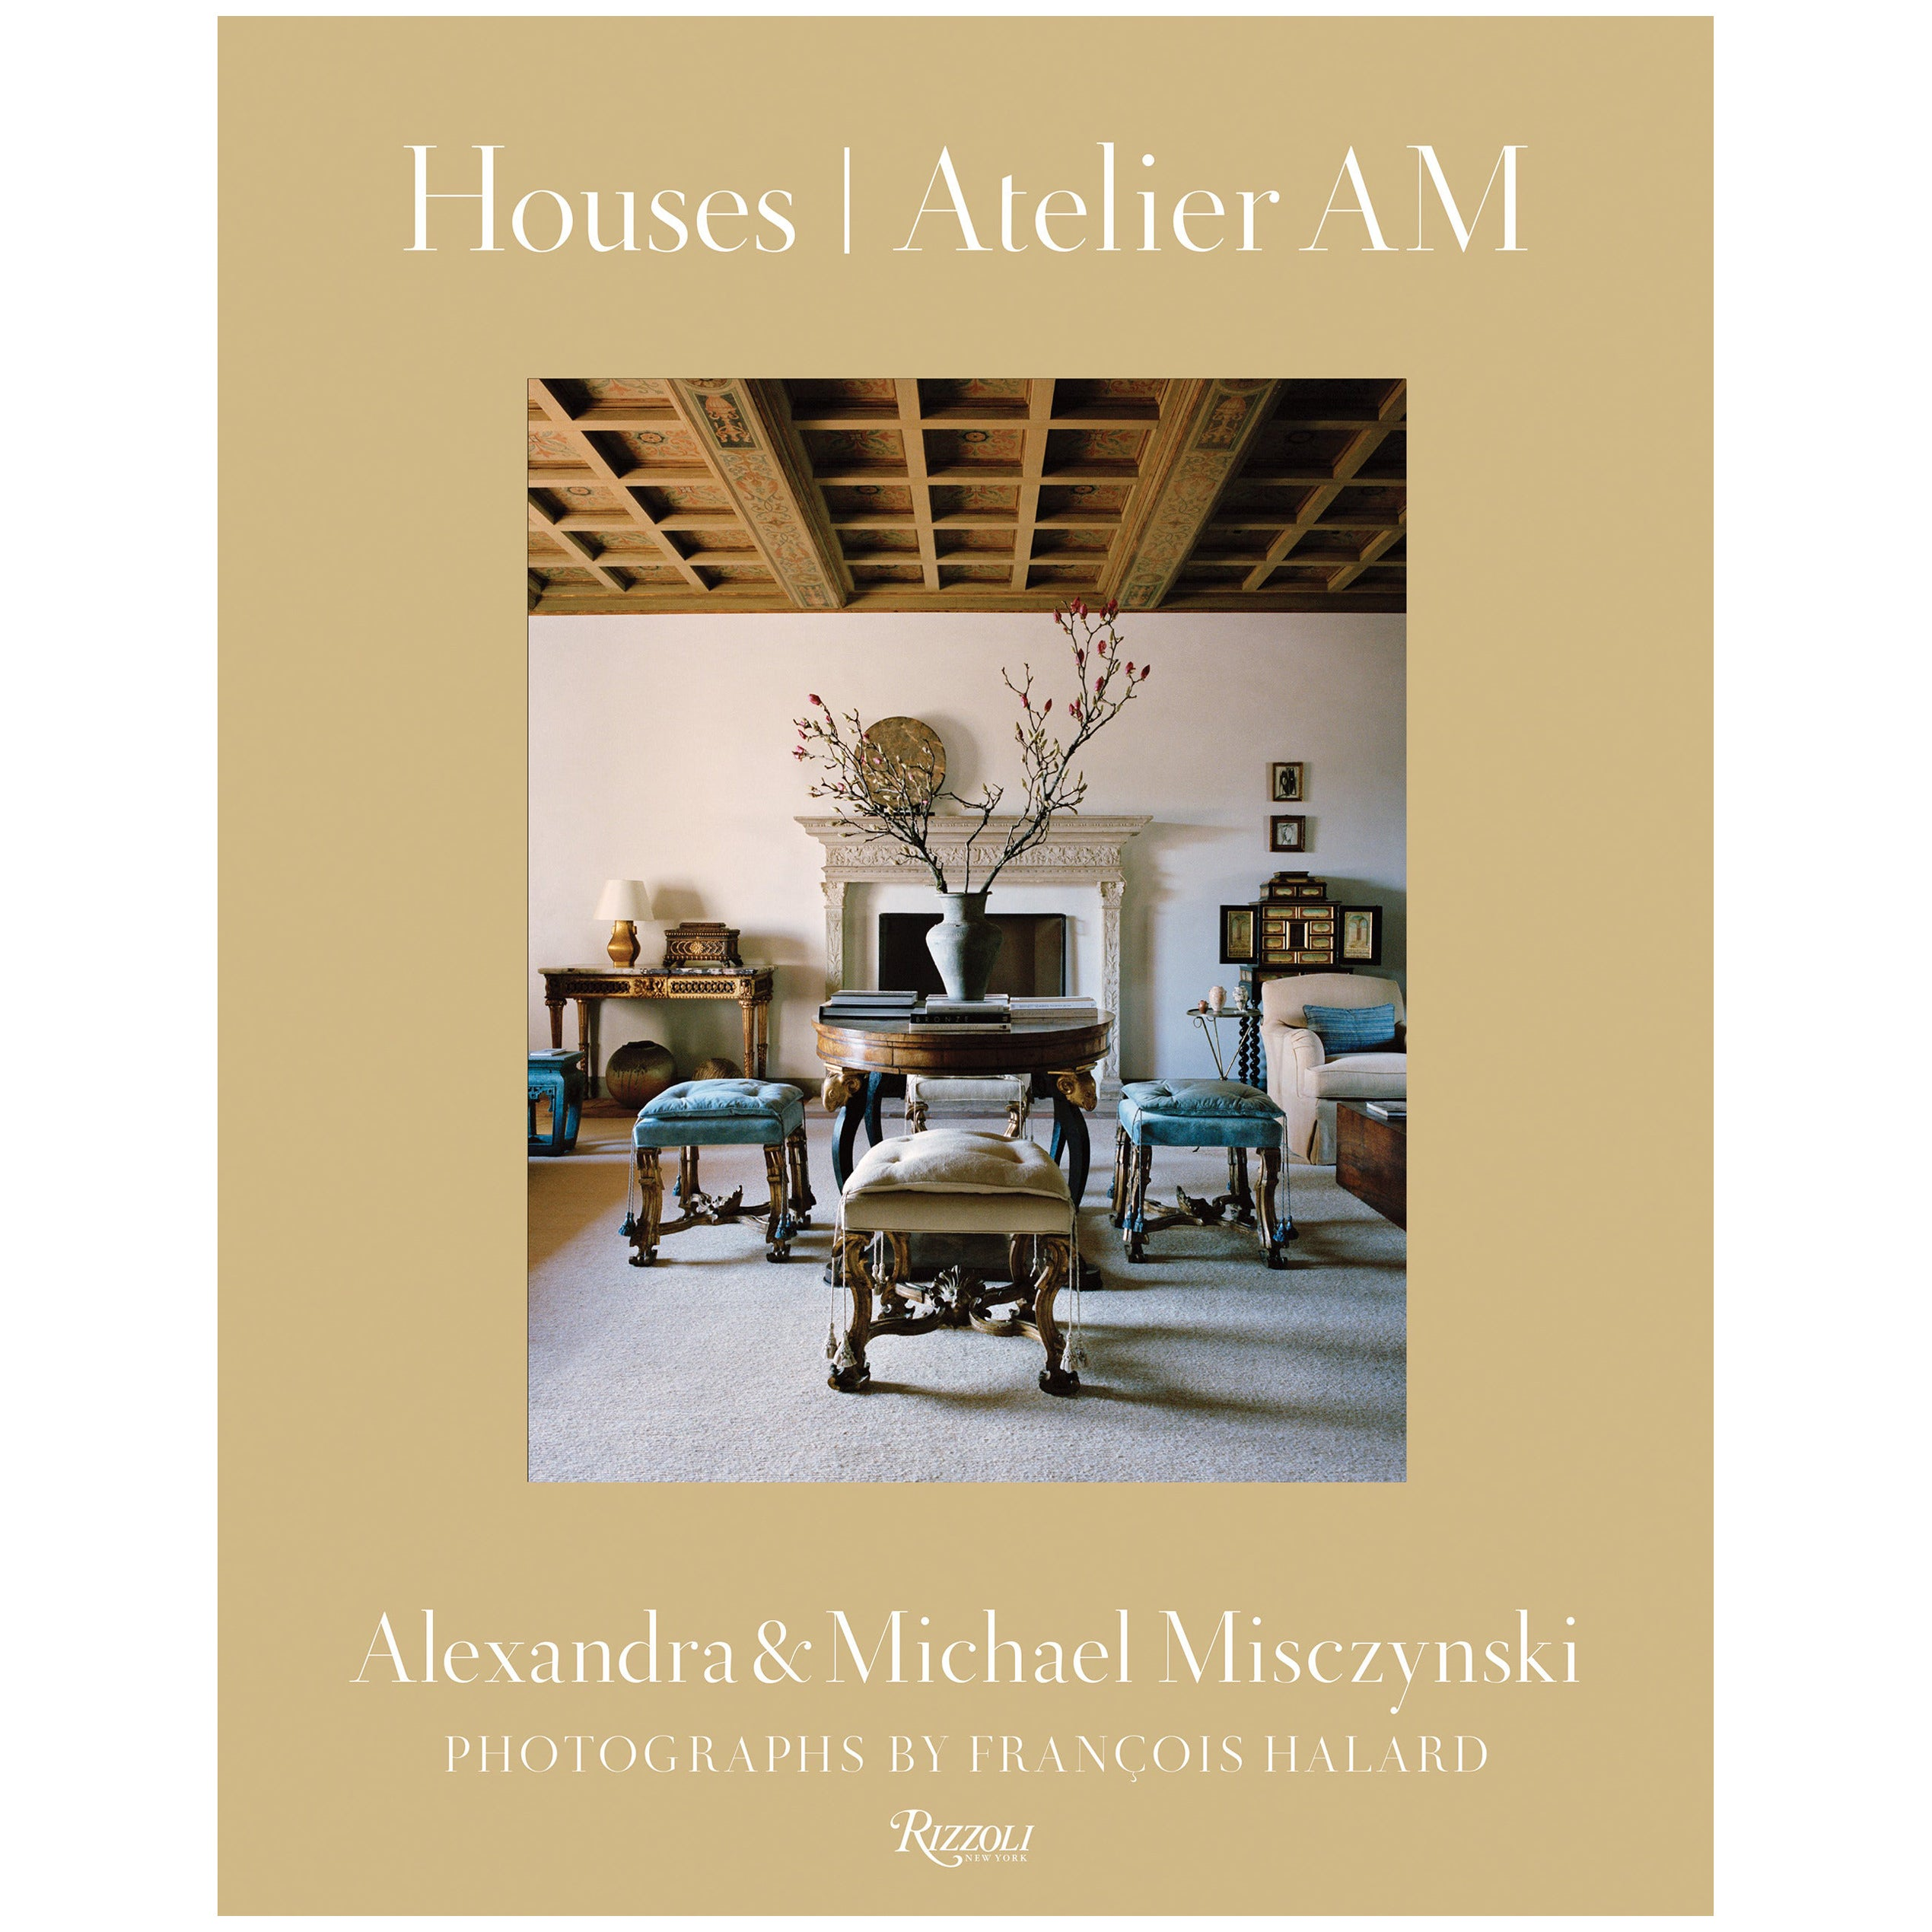 Houses Atelier AM